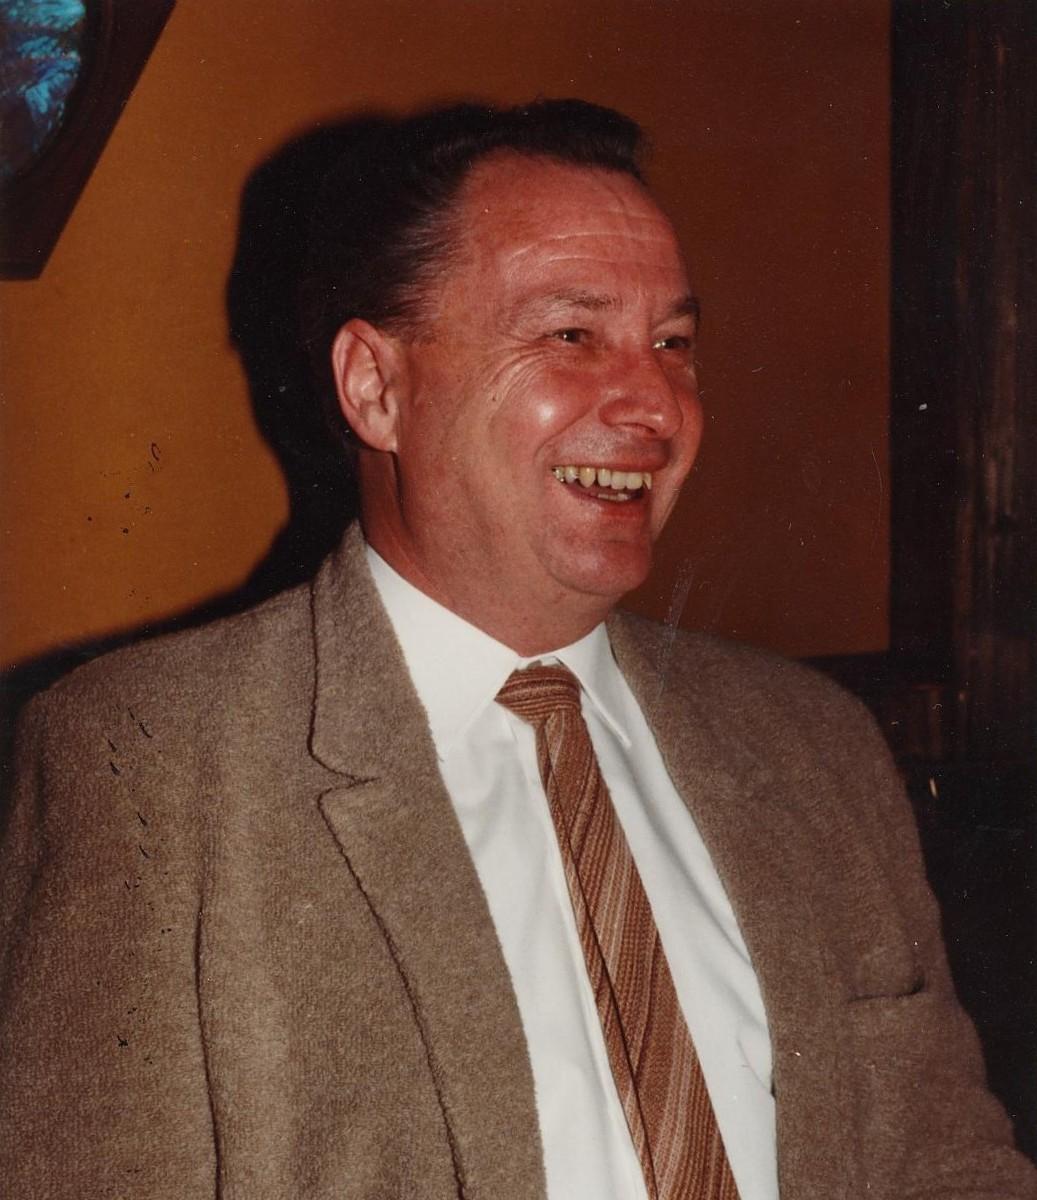 1951 - 1981 Kurt Zahnd